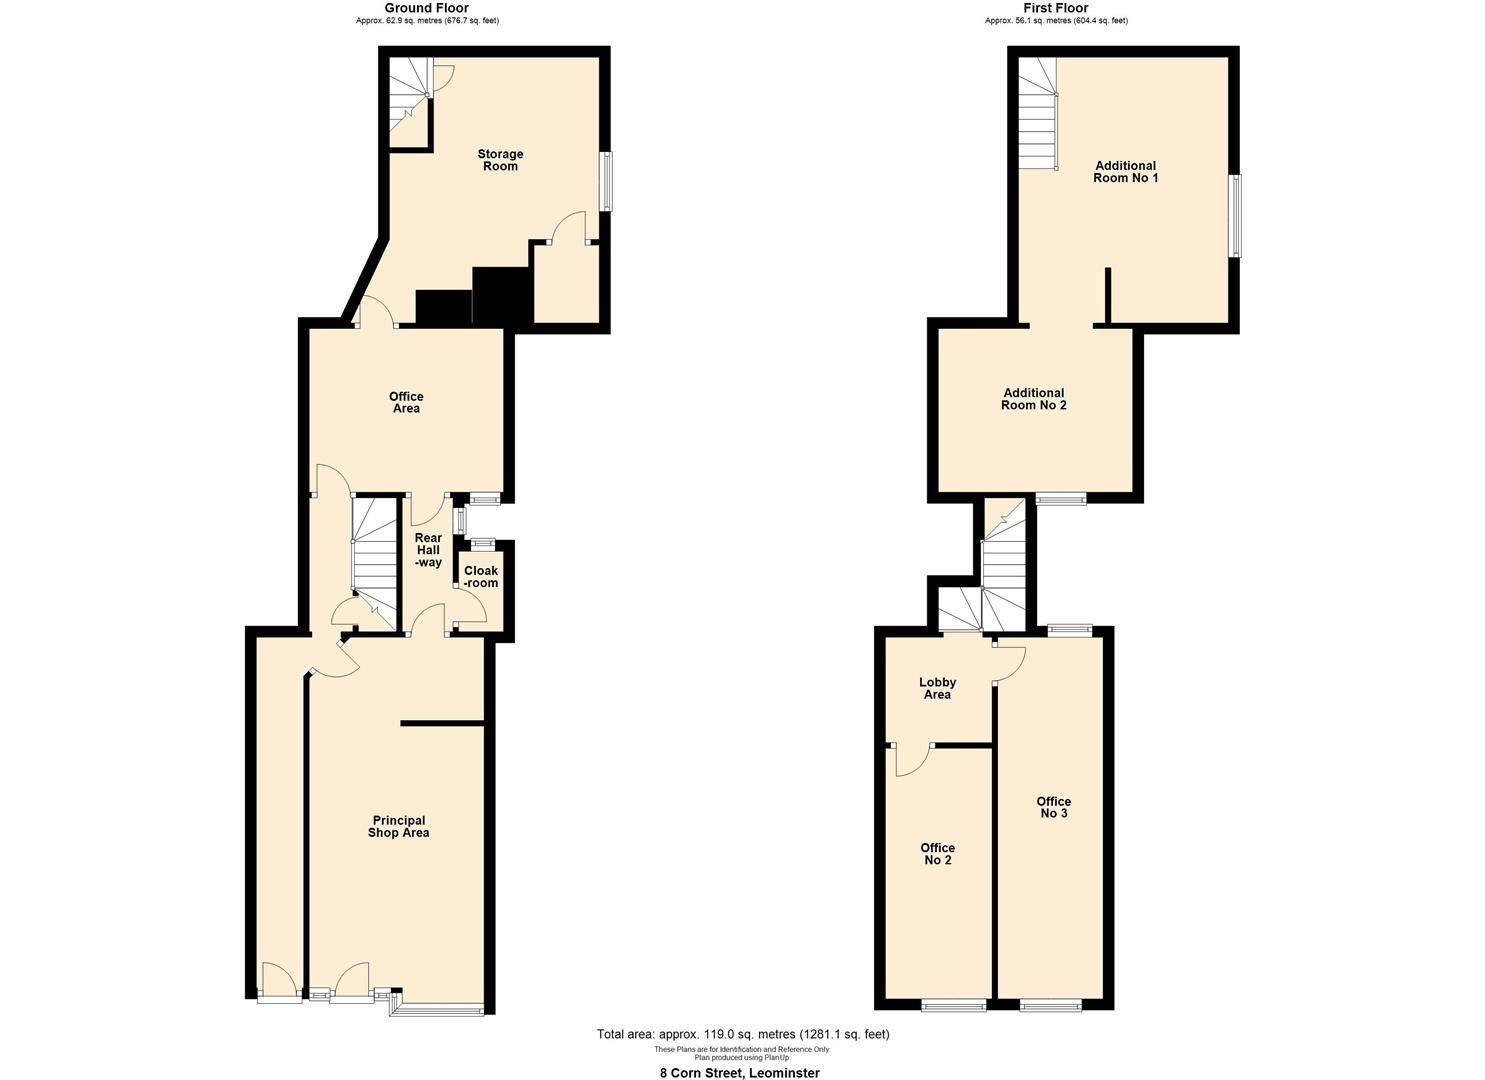 for sale in Leominster - Property Floorplan